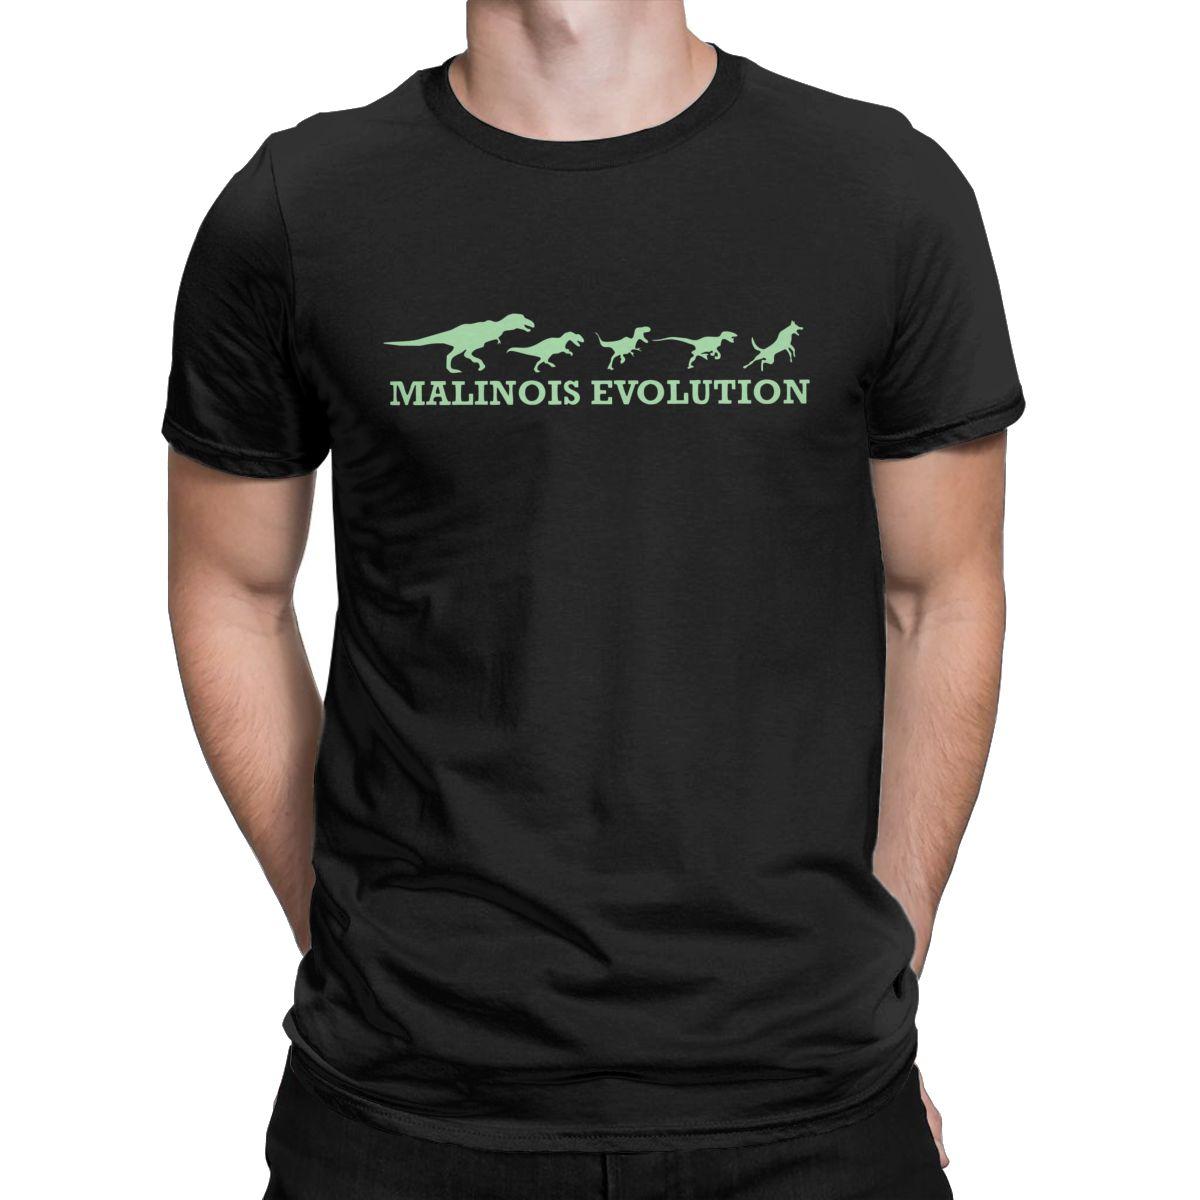 Malinois Evolution T Hemd Männer 100% Baumwolle Vintage T-Shirts Crewneck Belgischen Hund T Shirt Kurzarm Tops Geschenk Idee